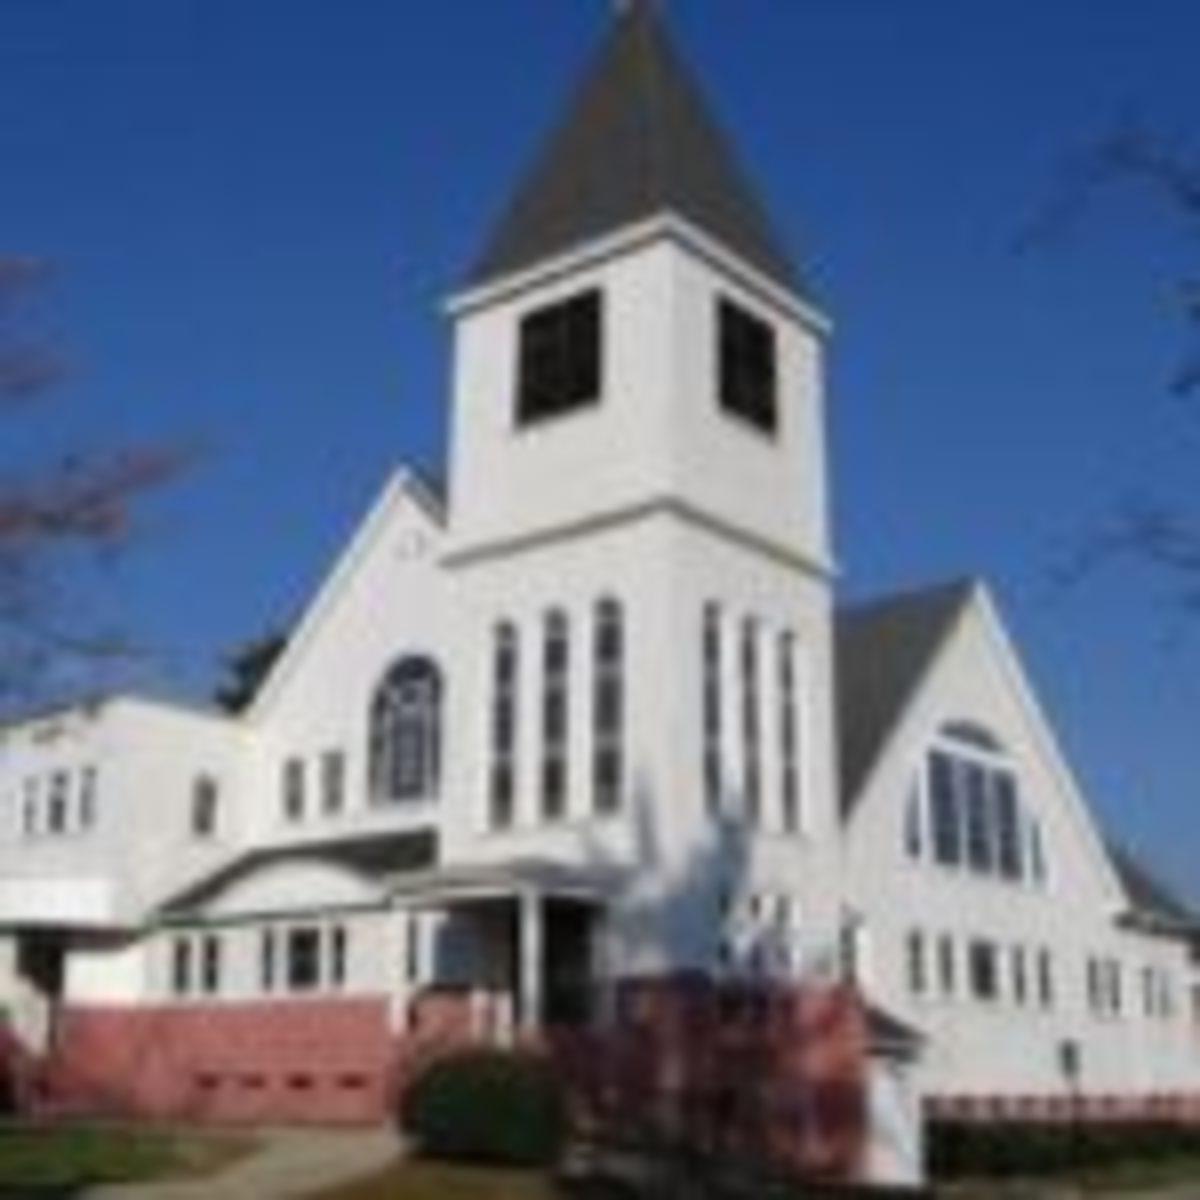 Second Congregational Church, Manchester, Connecticut.